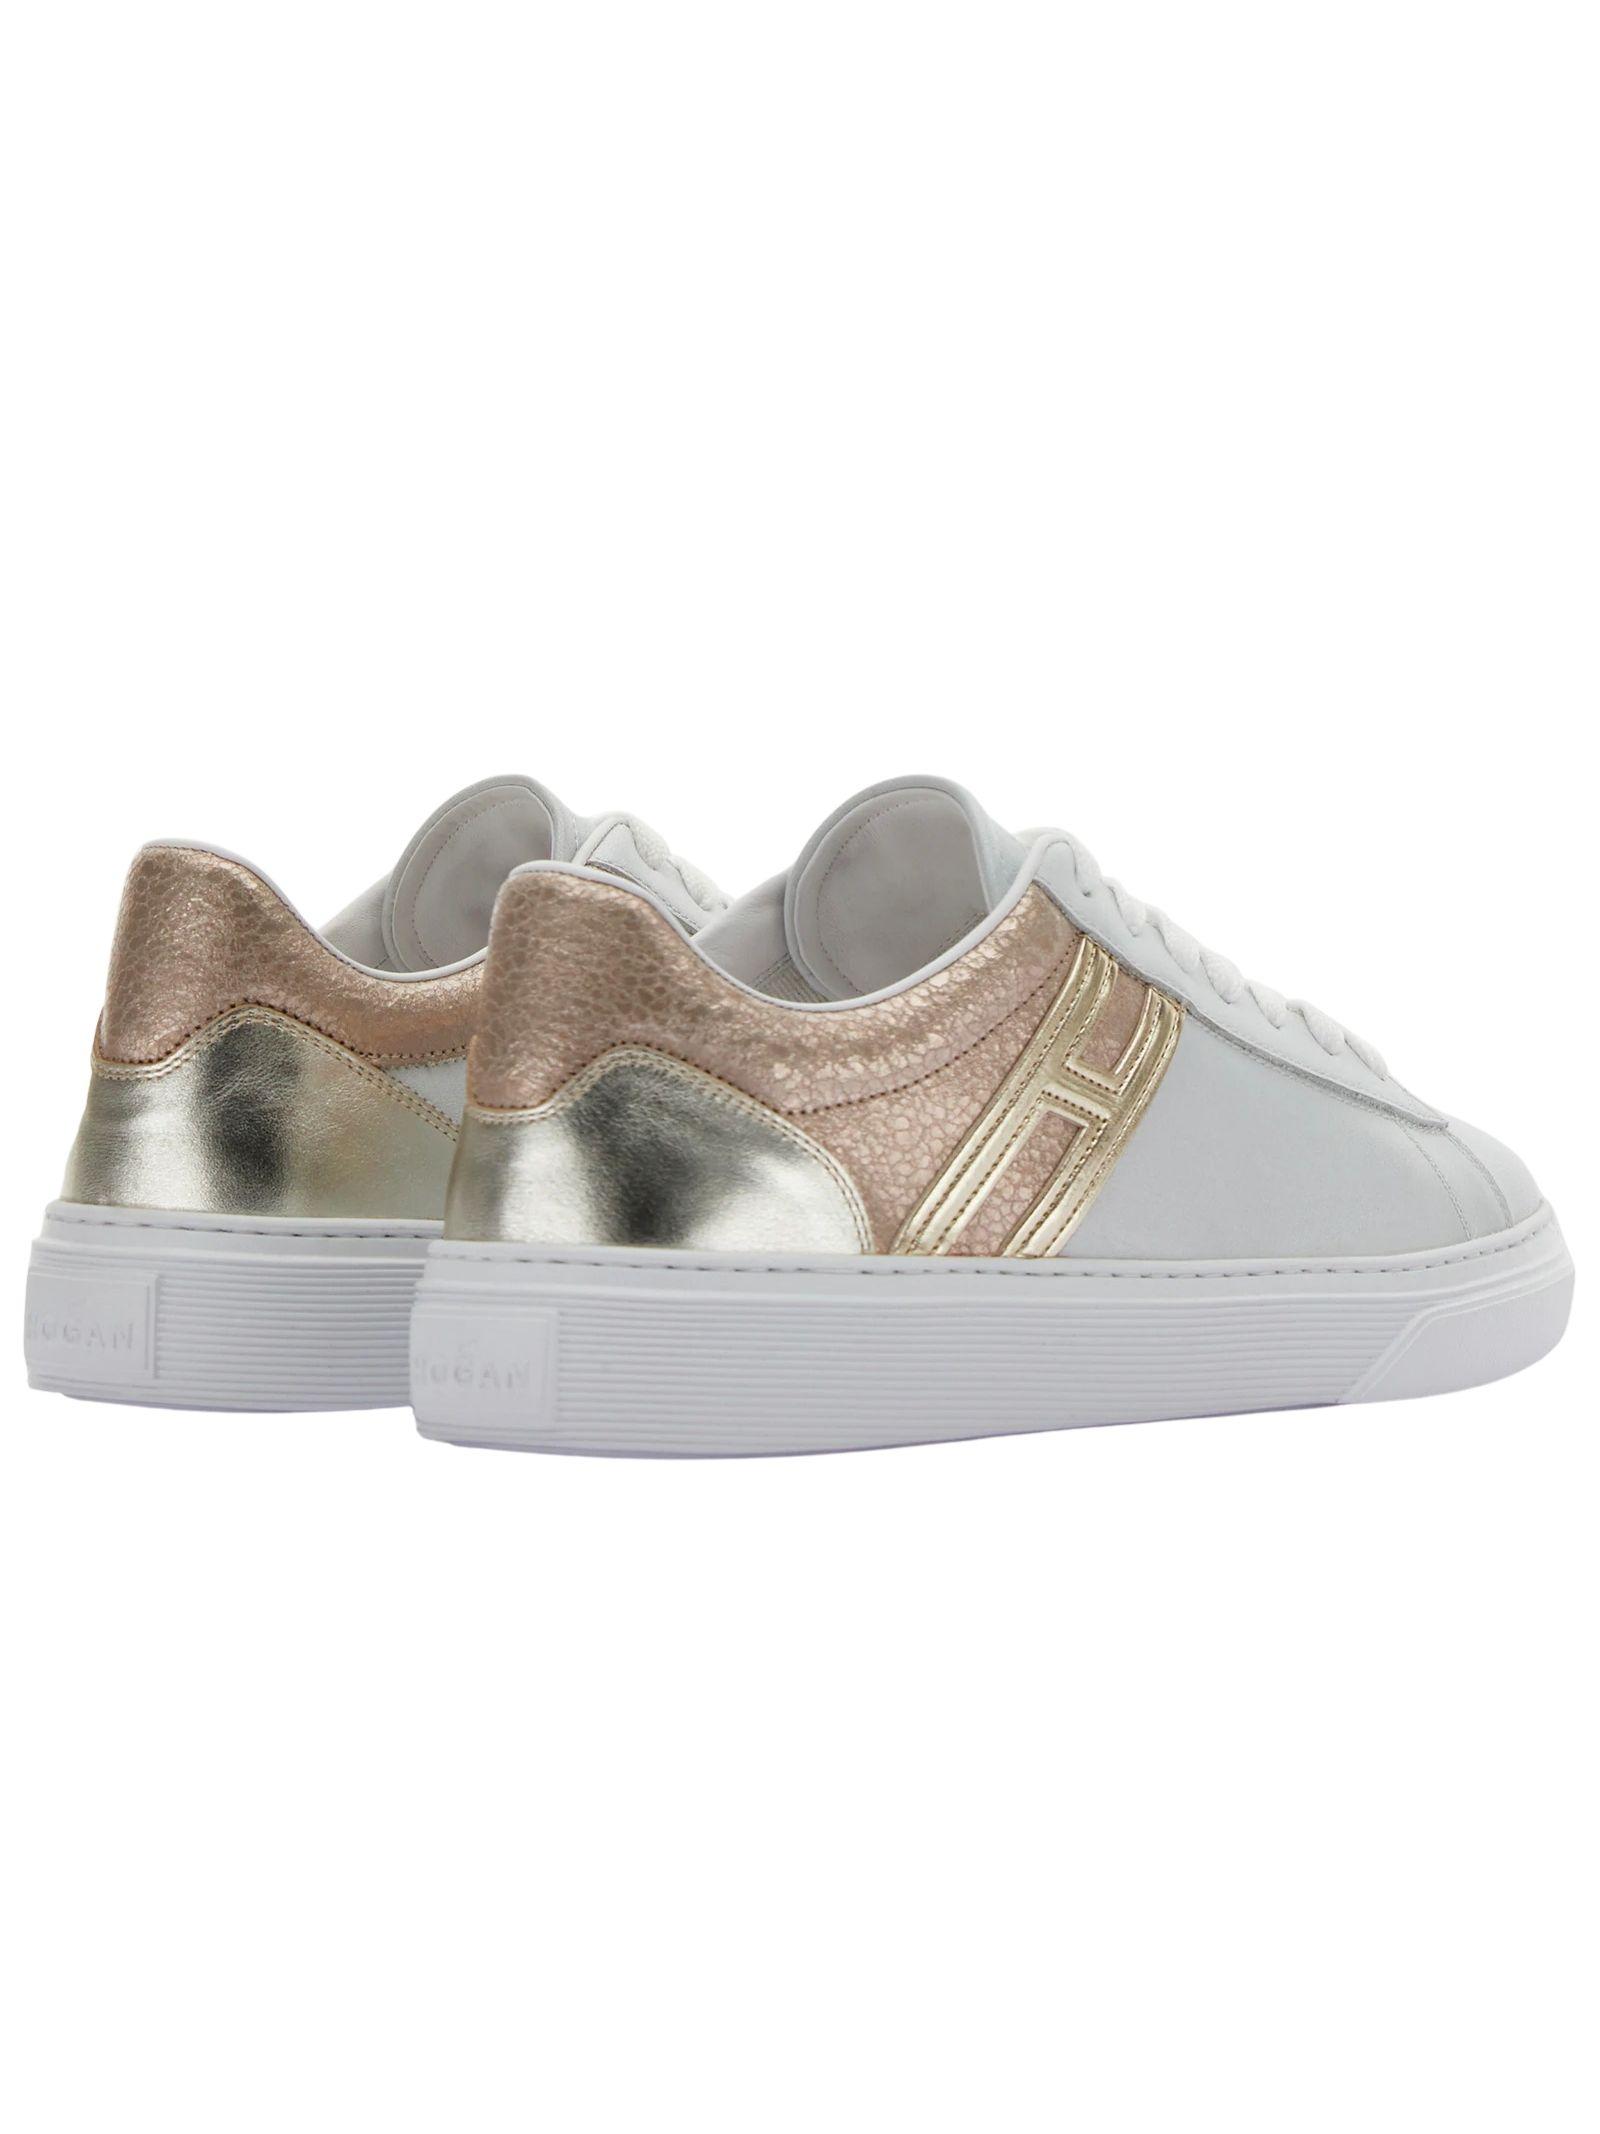 Sneakers in pelle e glitter HOGAN | Scarpe | HXW3650J970P971556